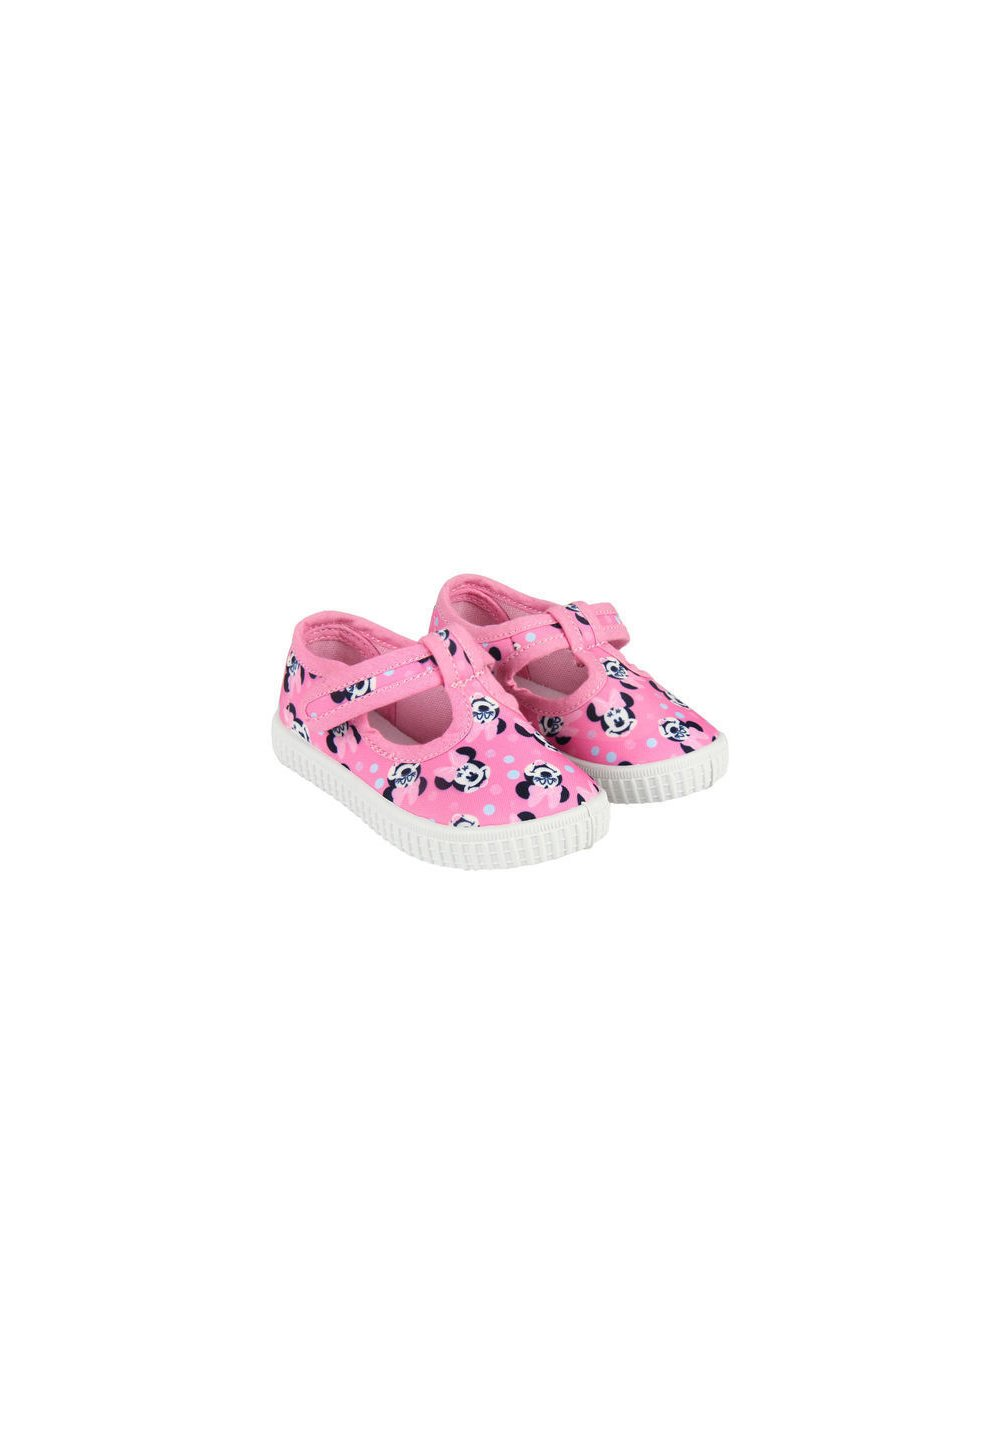 Incaltaminte panza, roz cu buline, Minnie Mouse imagine